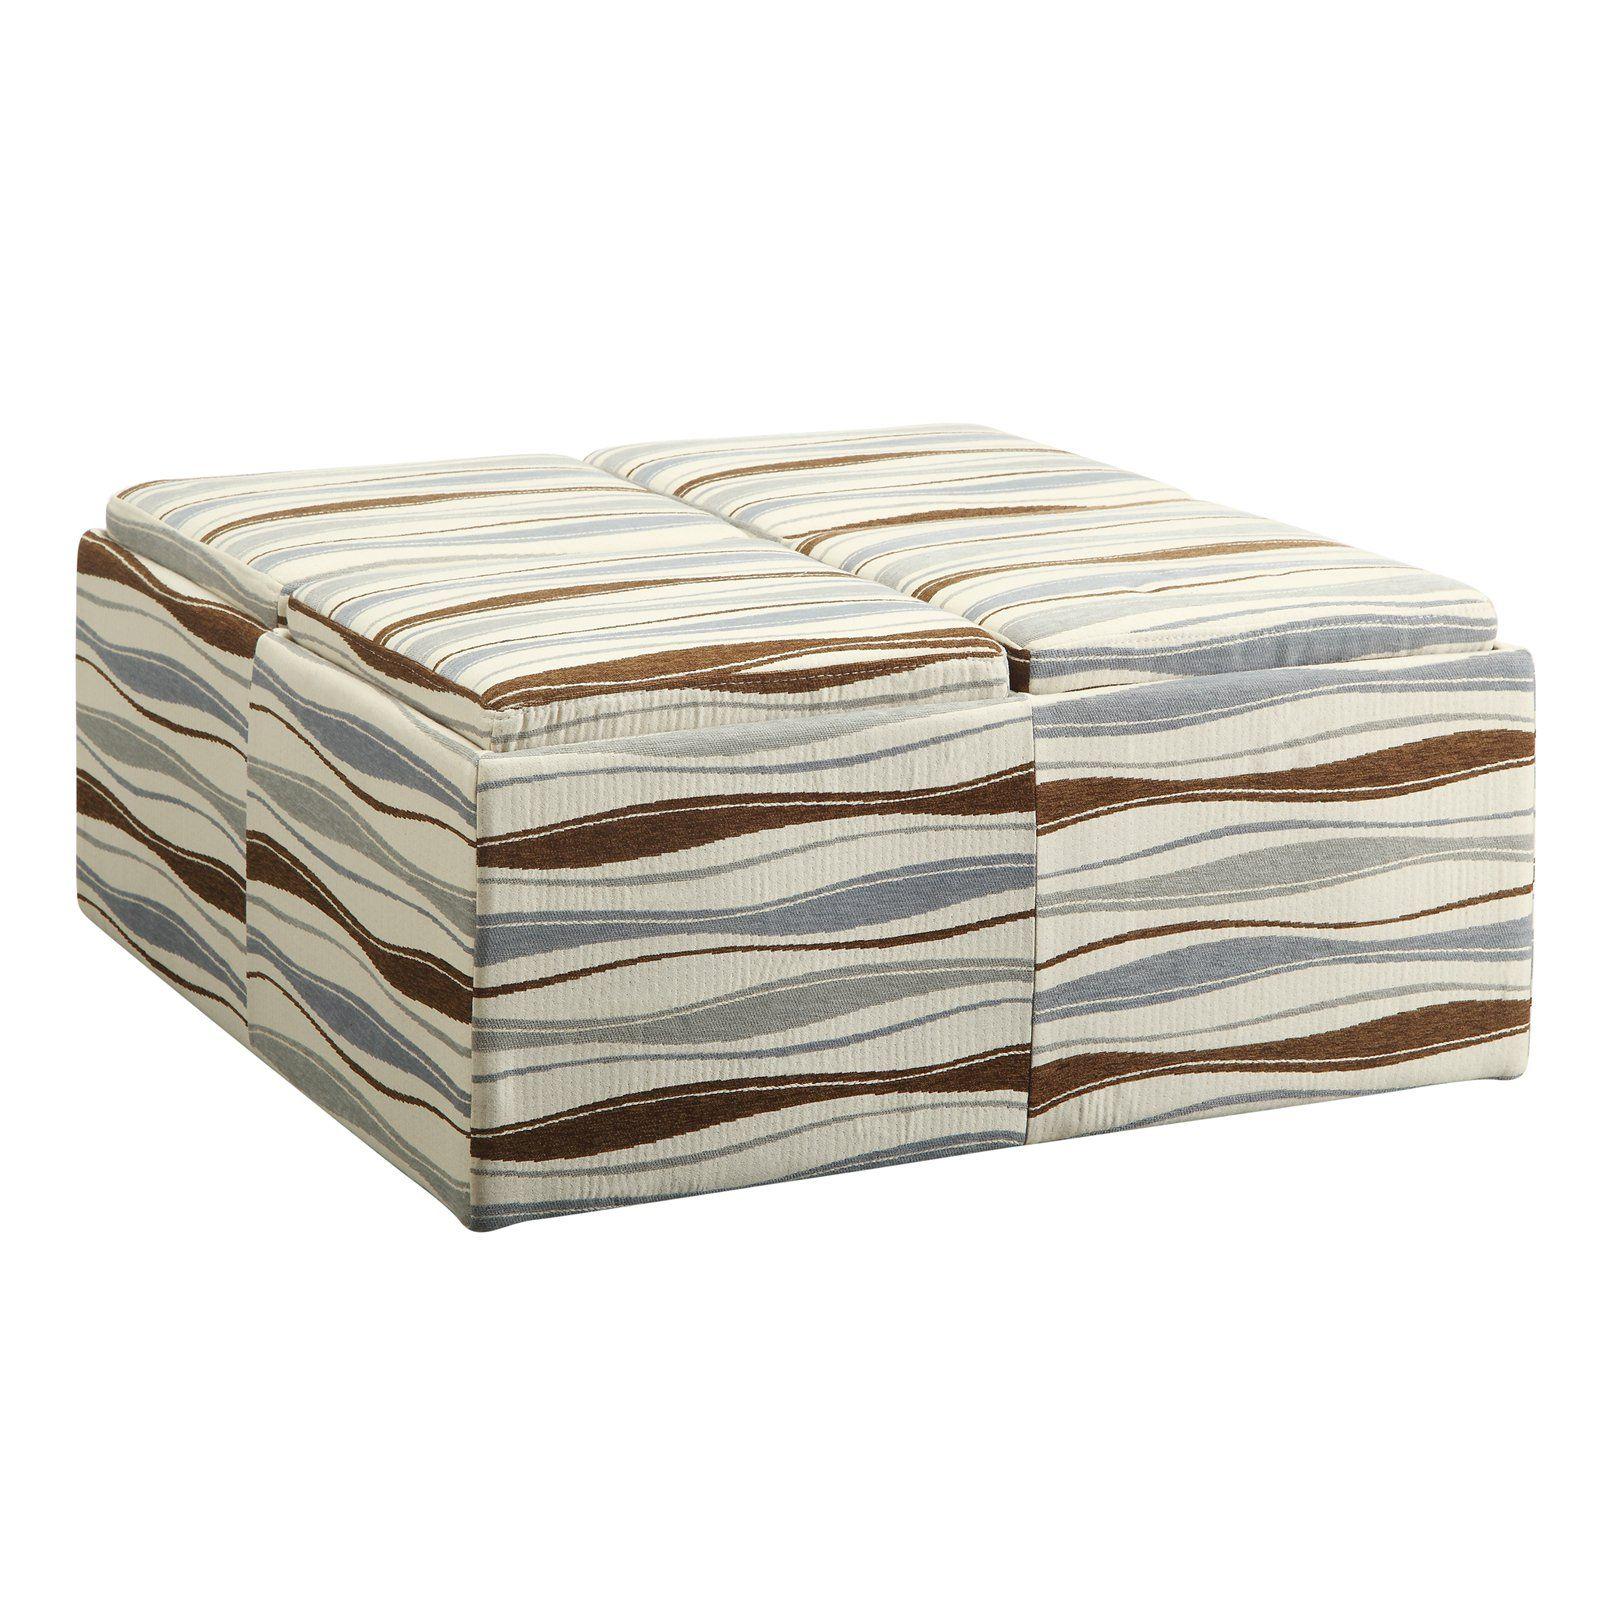 Inspire Q Wavy Striped Storage Ottoman   $302.4 @hayneedle